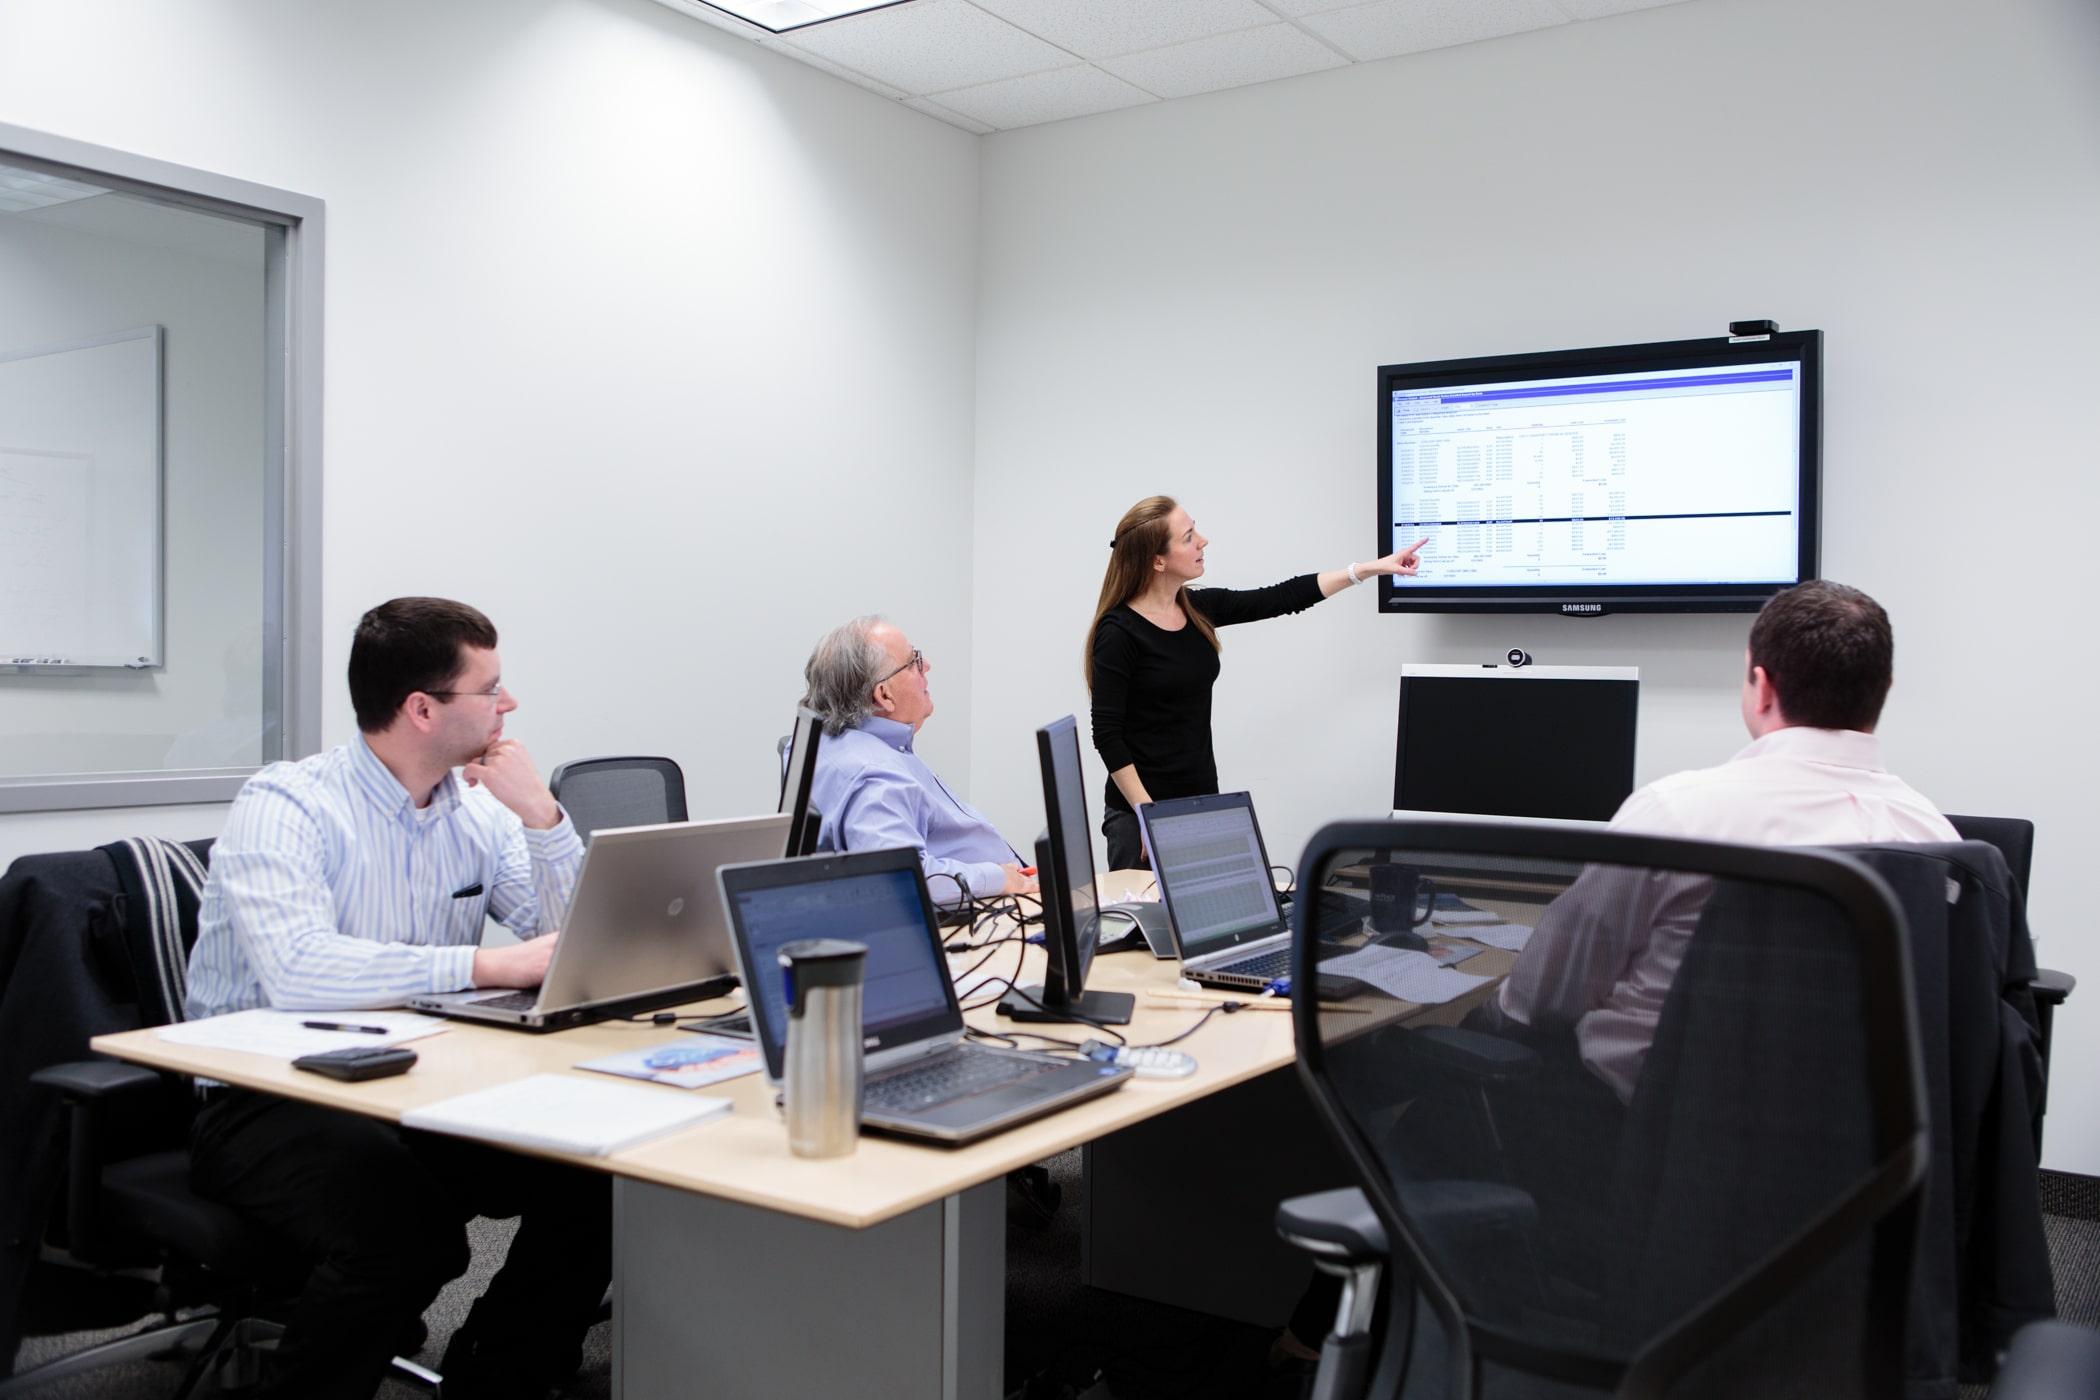 https://www.gocloudwave.com/wp-content/uploads/2019/07/Accounting-Team-Meeting-min.jpg